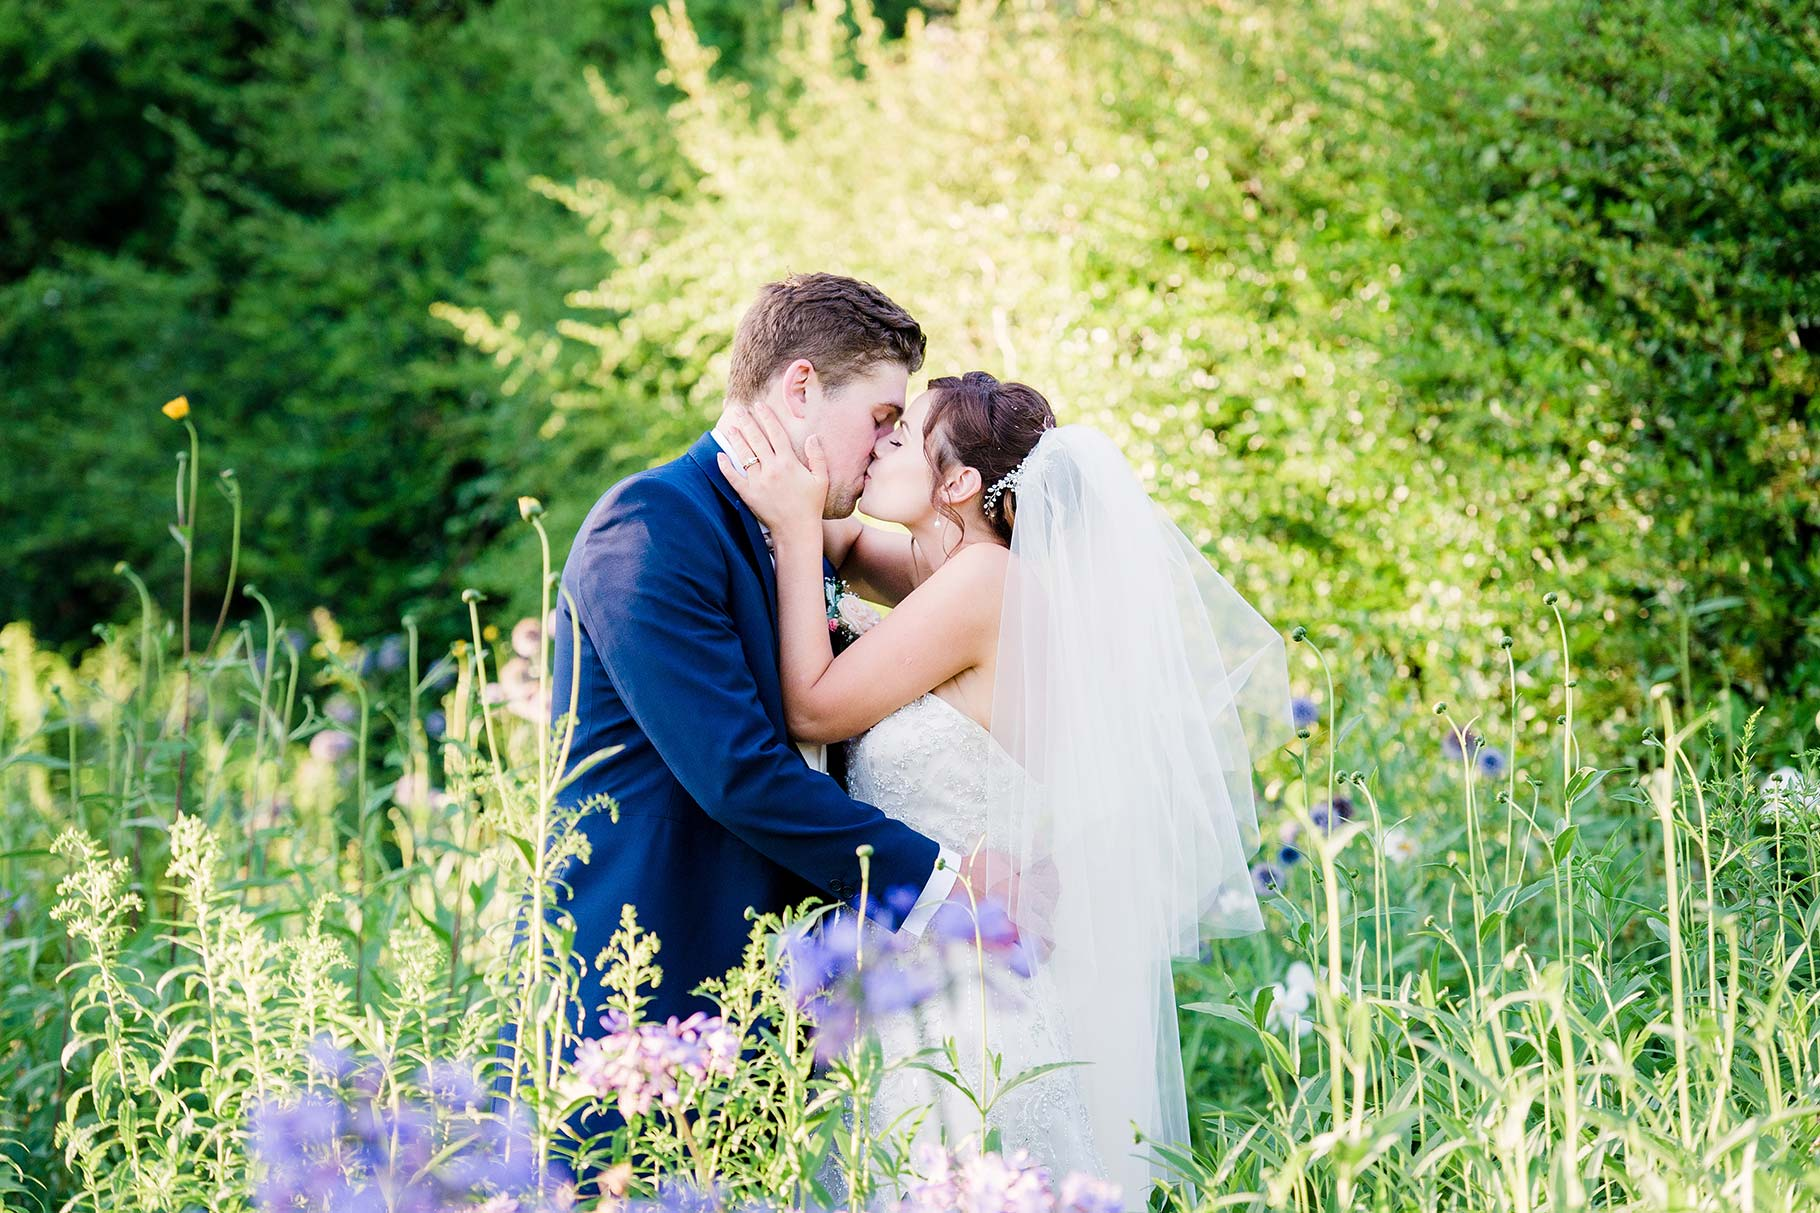 Romantic-wedding-image